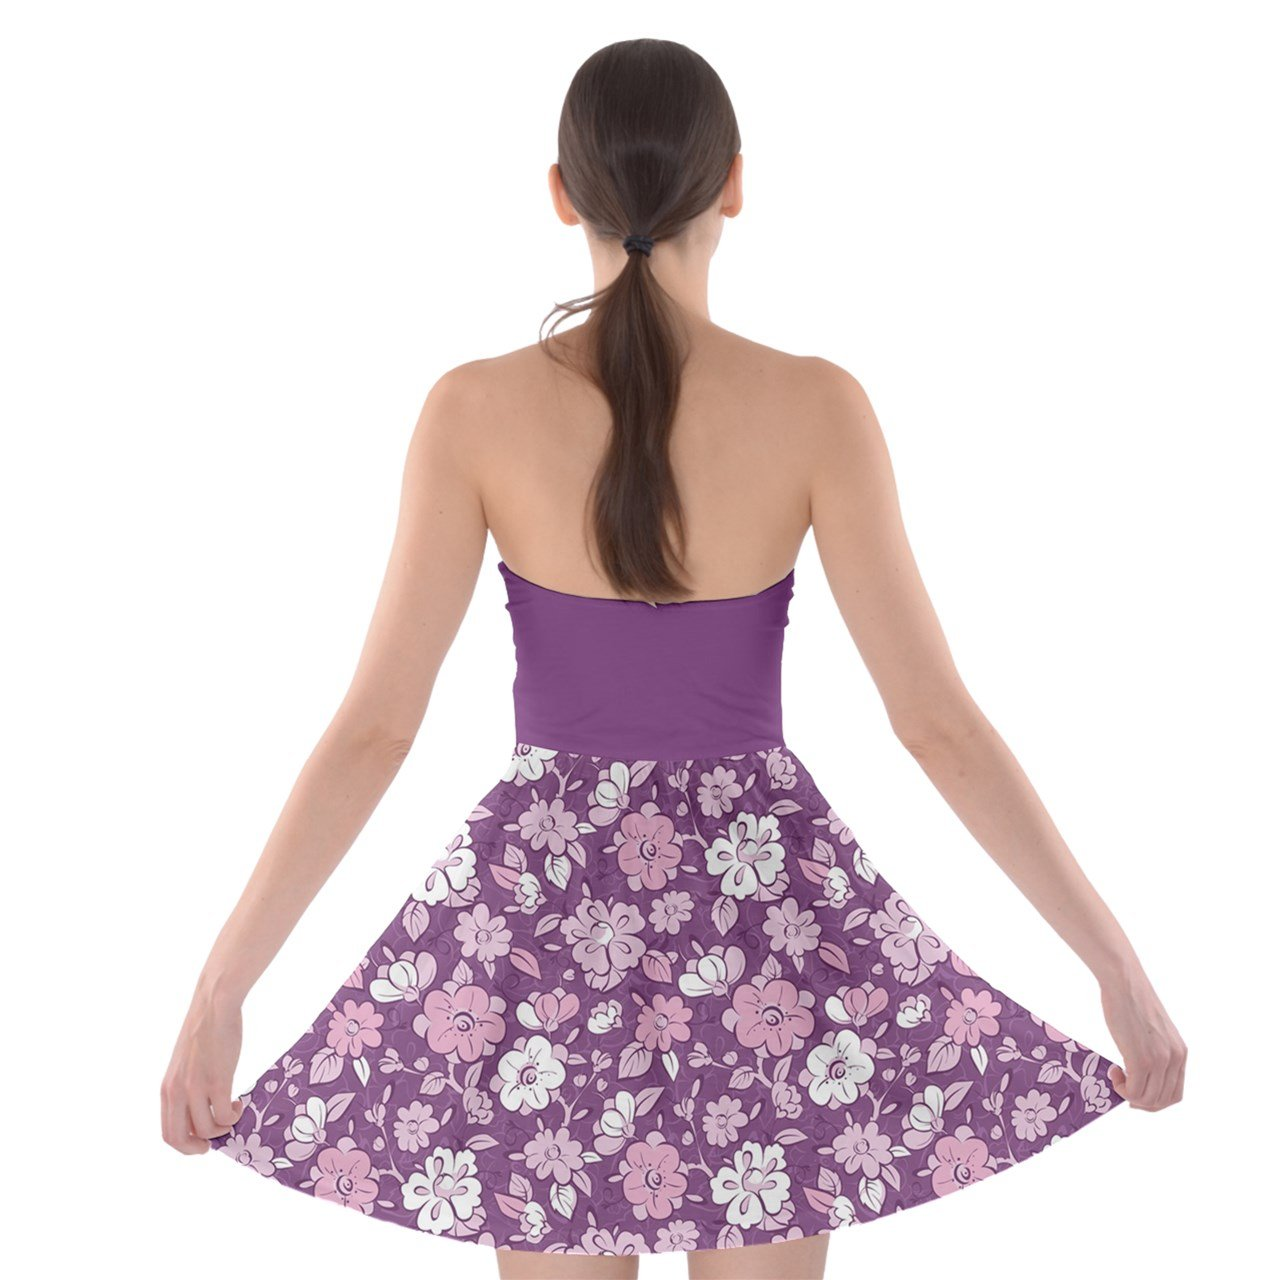 e912353e04 PattyCandy Womens Stylish Flowers Design Tube Top Bra Strapless Dress